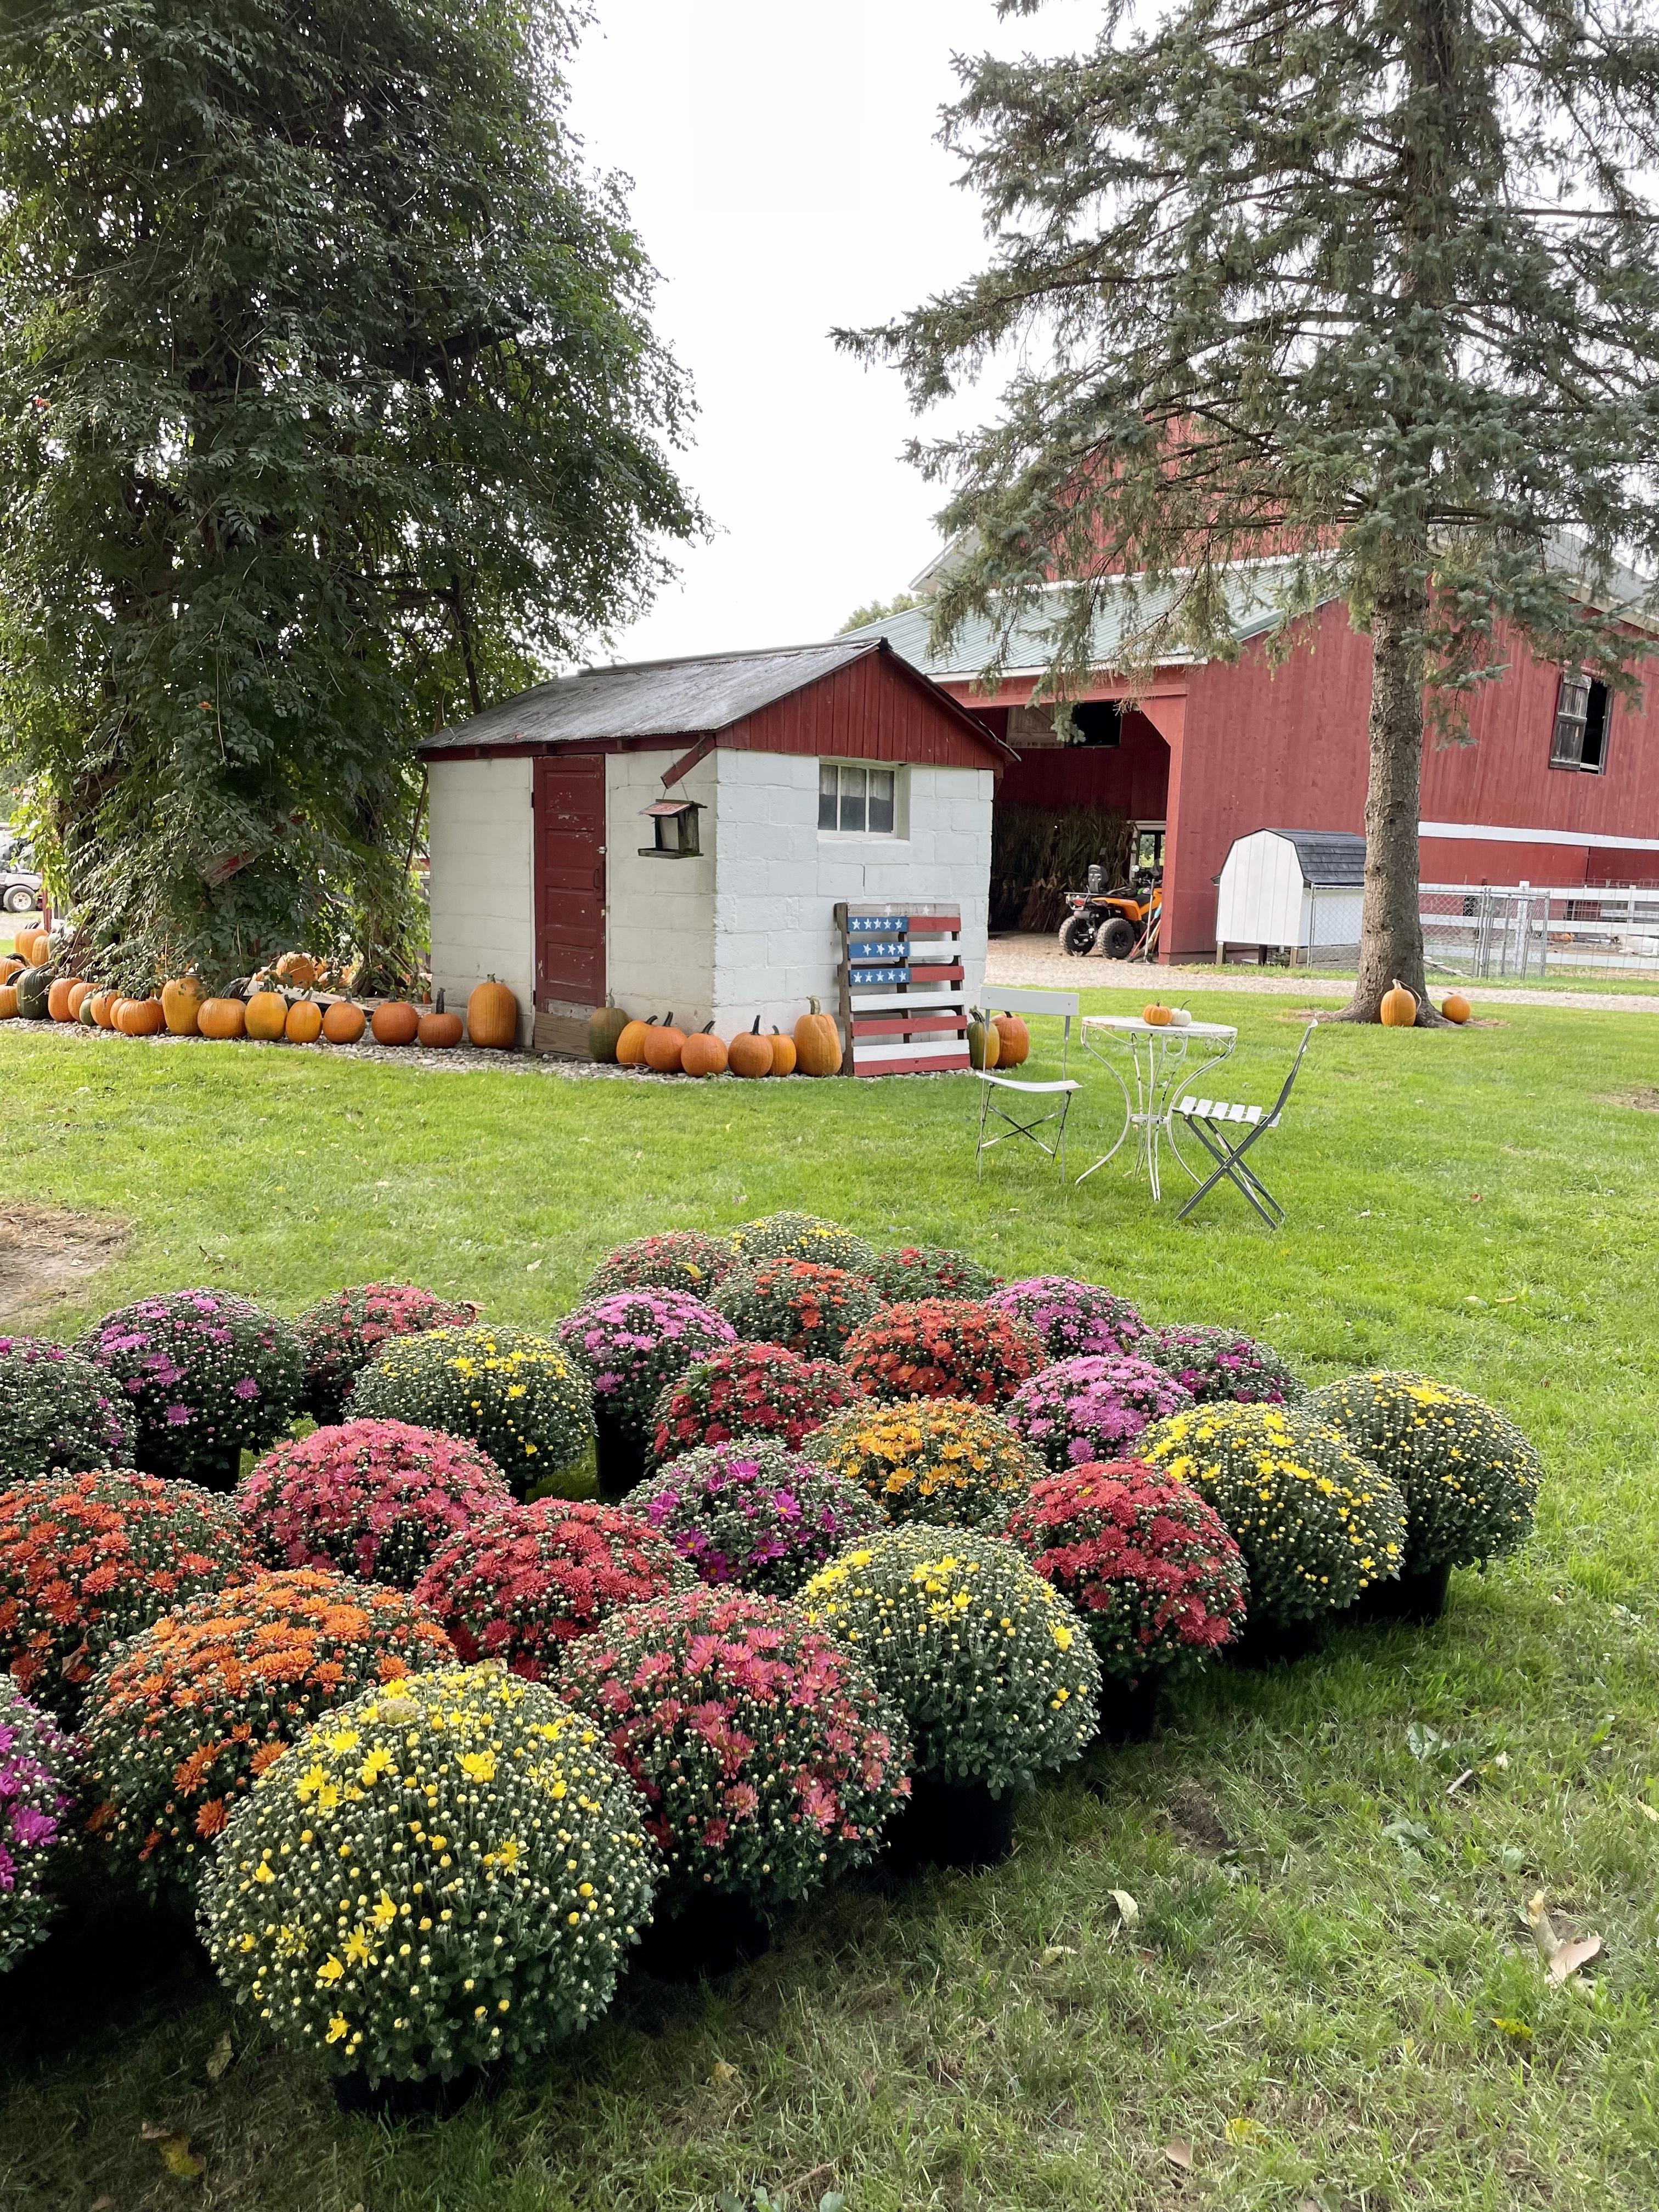 Chambers Farm in Pinckney, Michigan